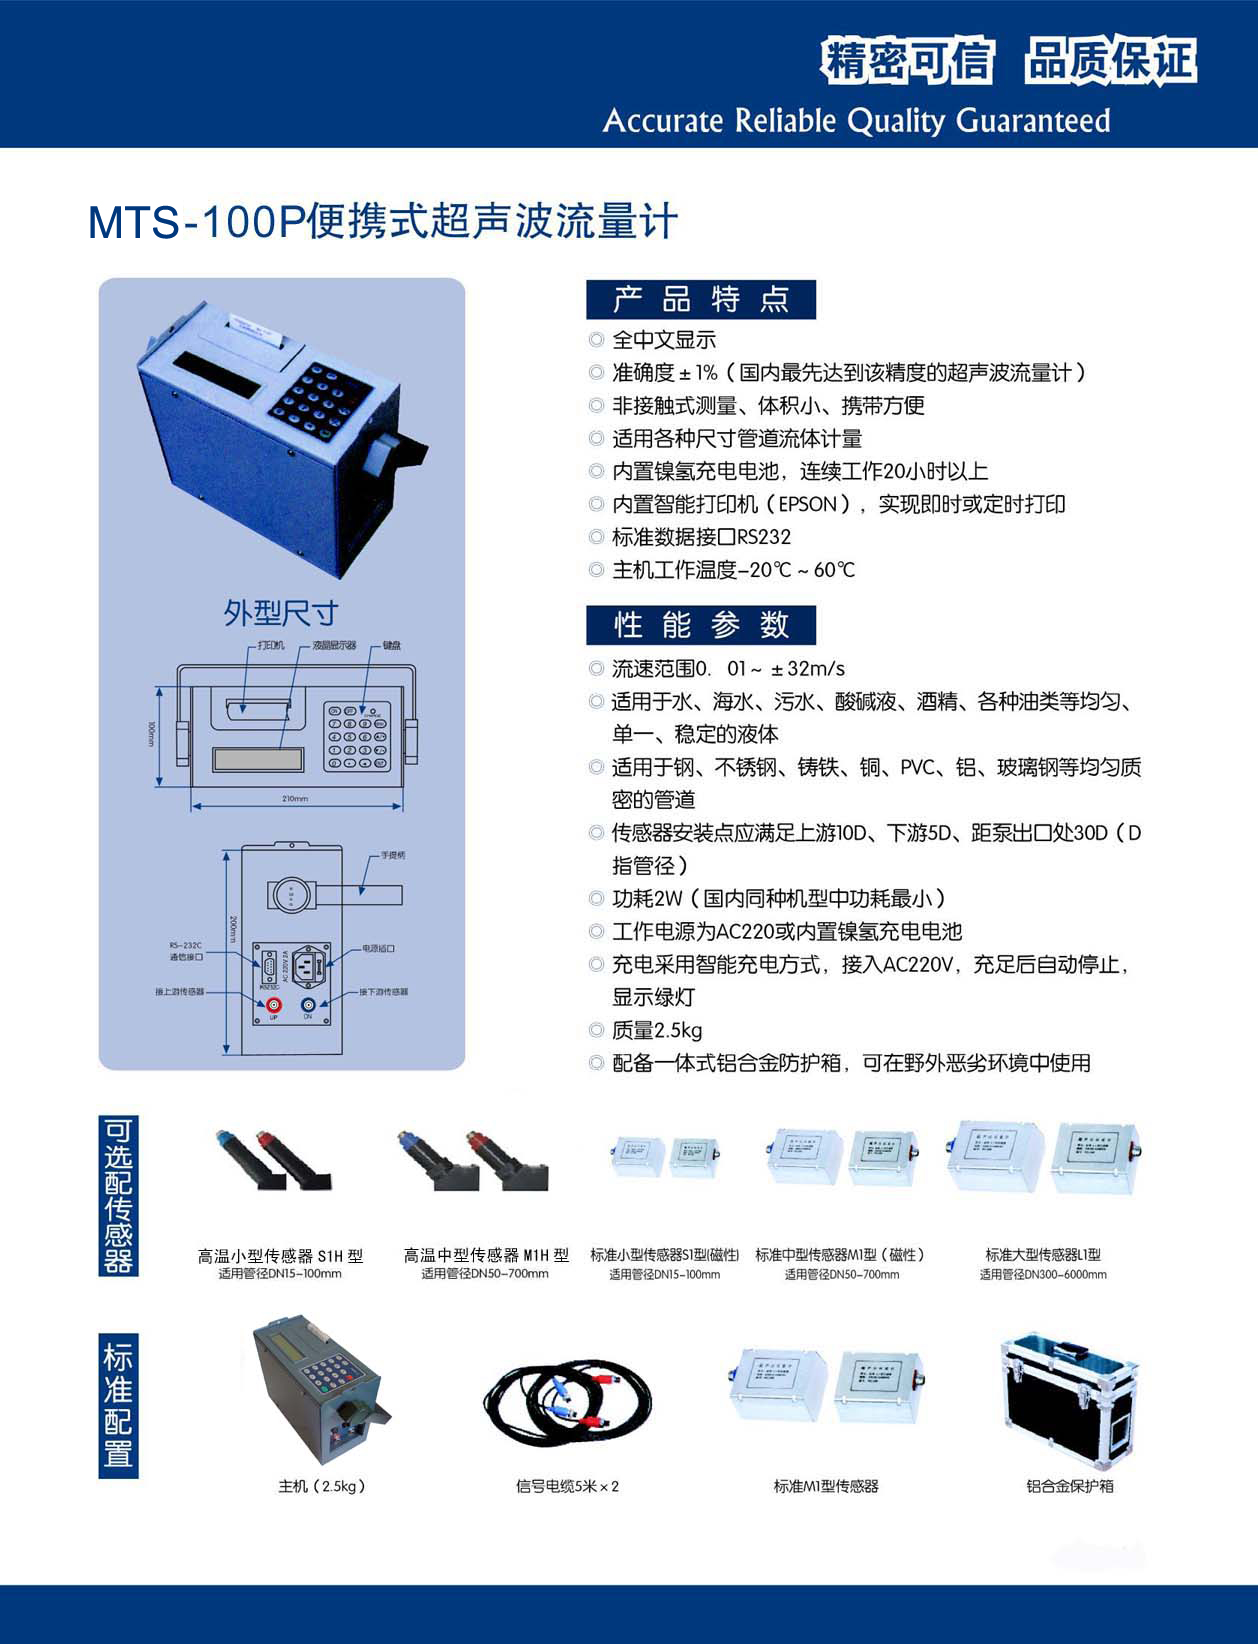 MTS-100P便携式超声波流量计